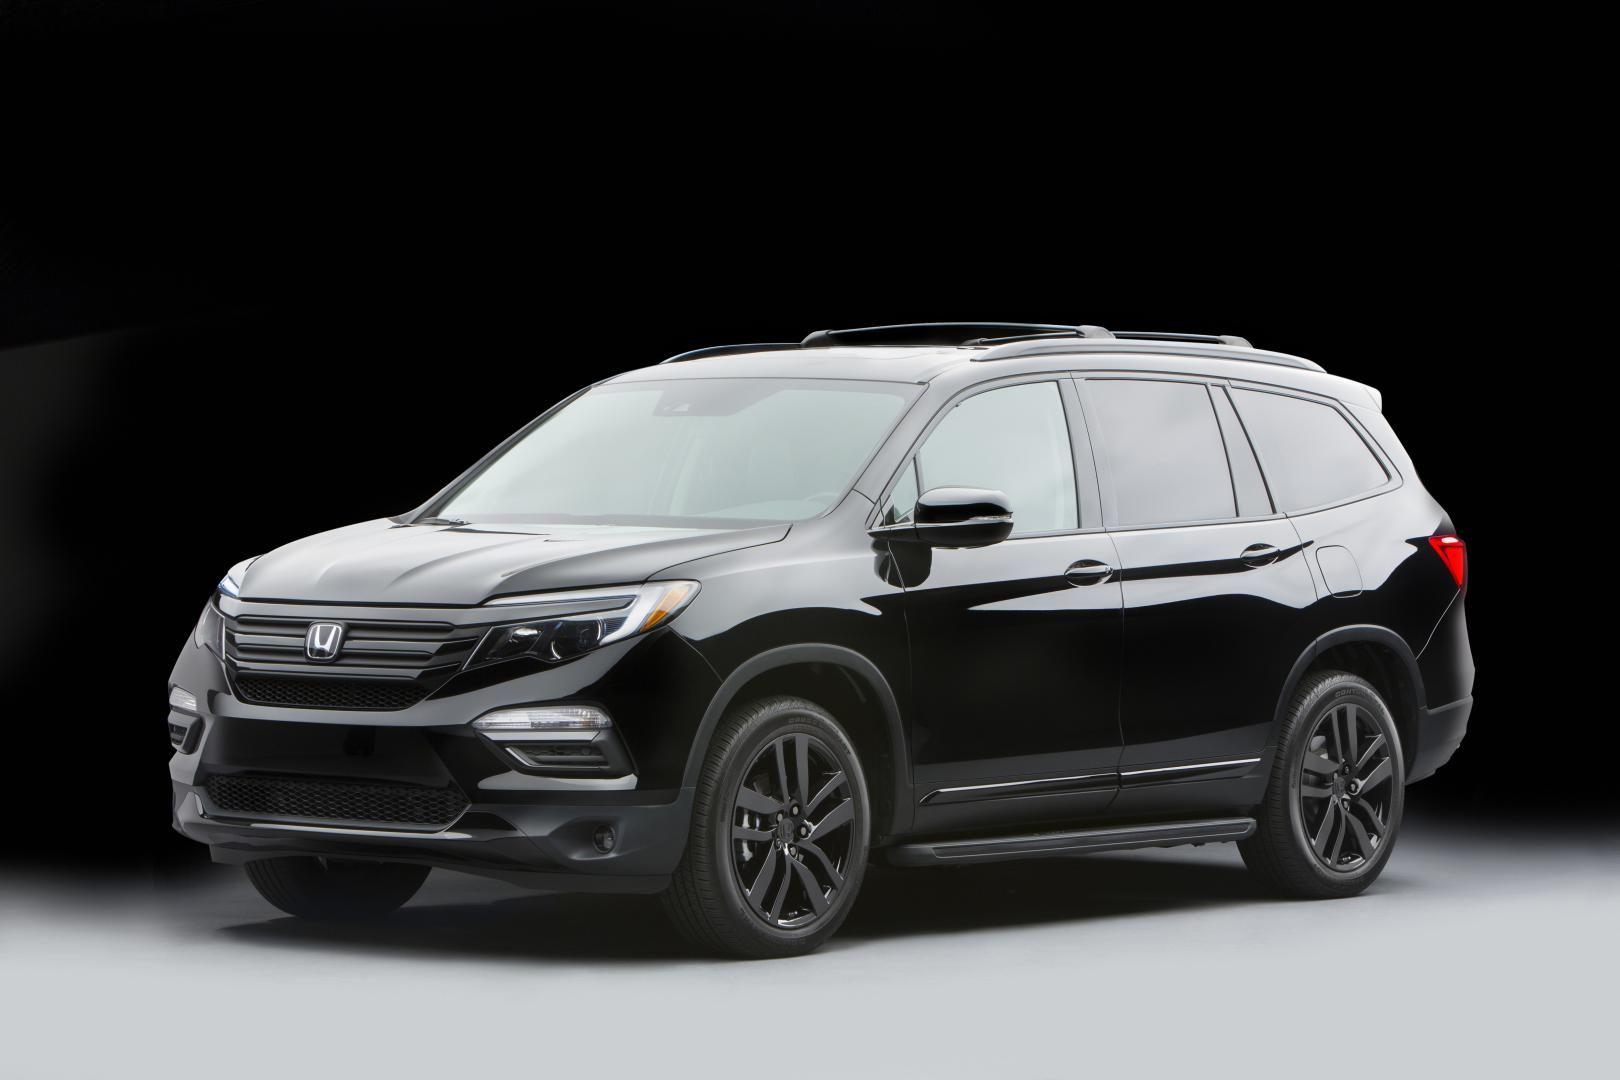 Black 2017 Honda Pilot